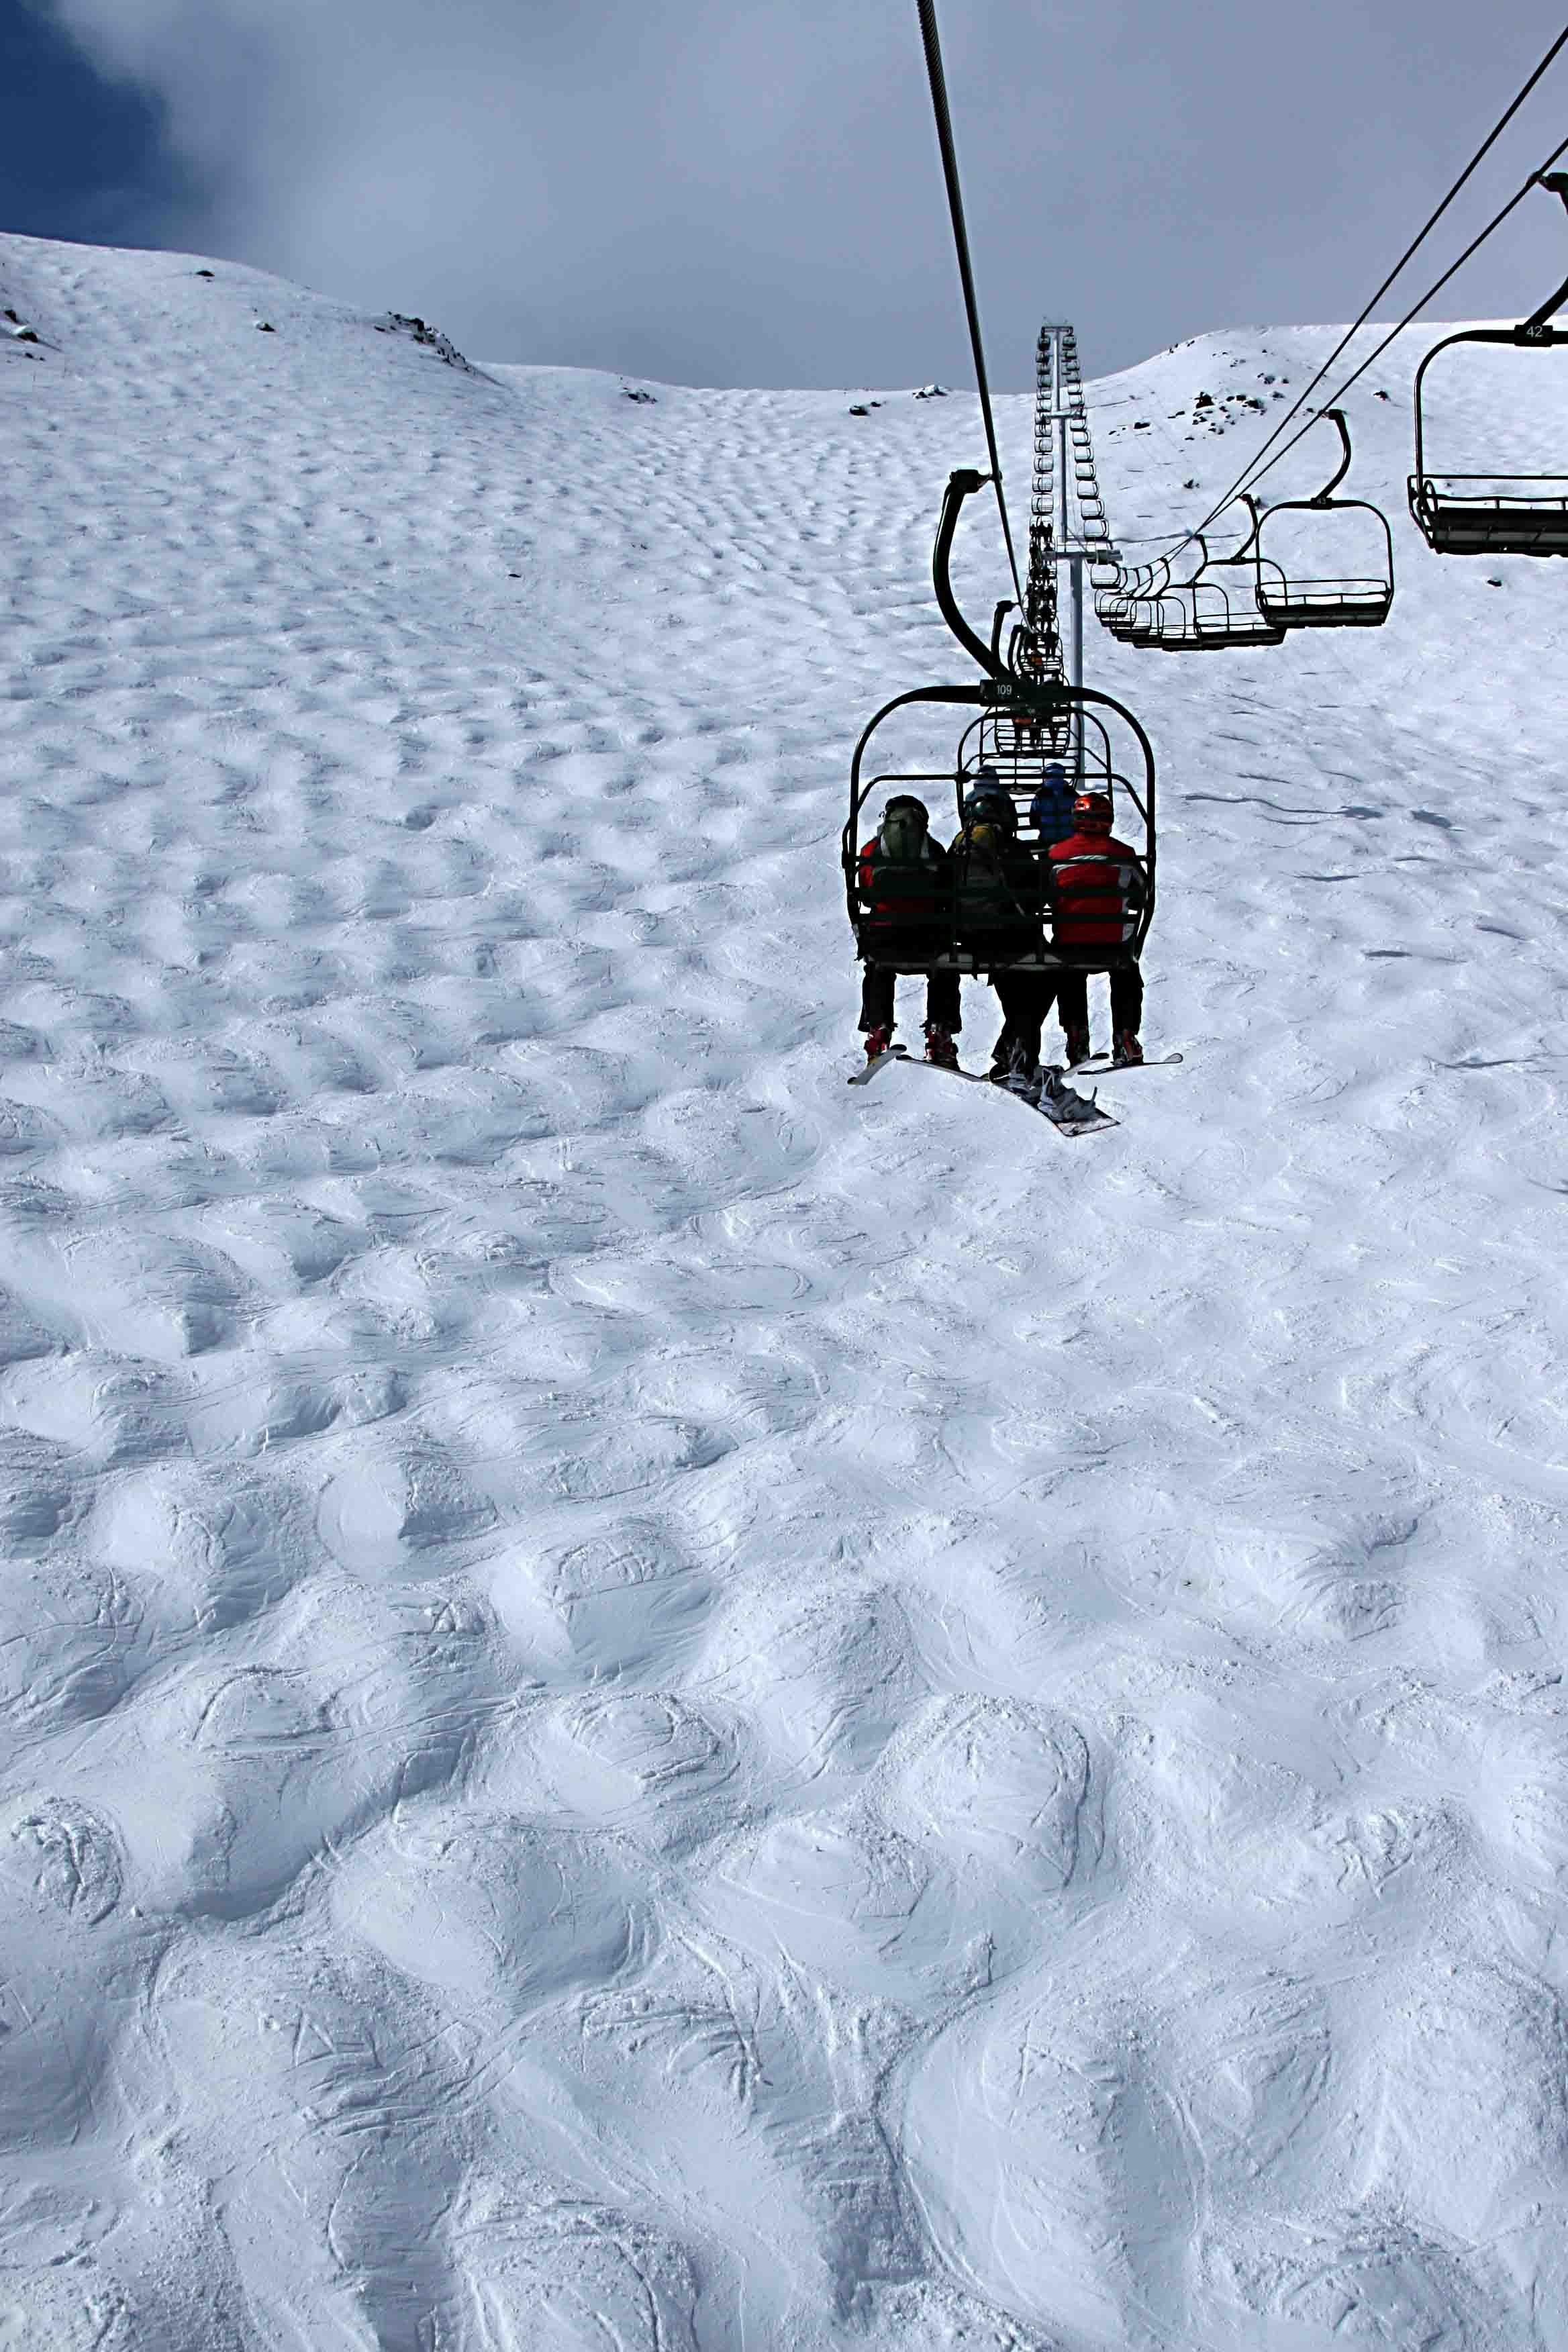 ❄~ paradise chair - comedy bowl - lake louise ski resort, alberta